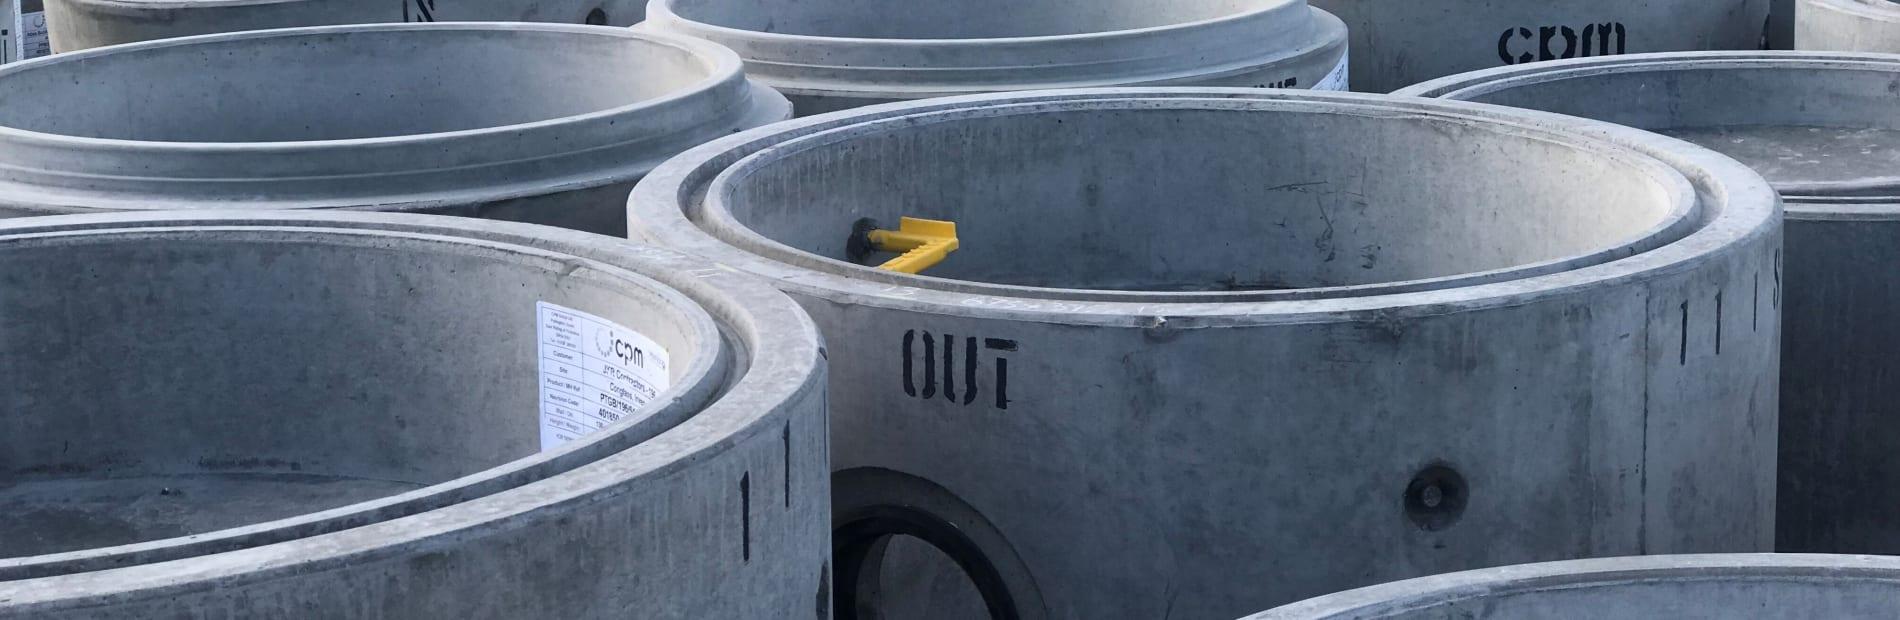 Concrete sealed manholes